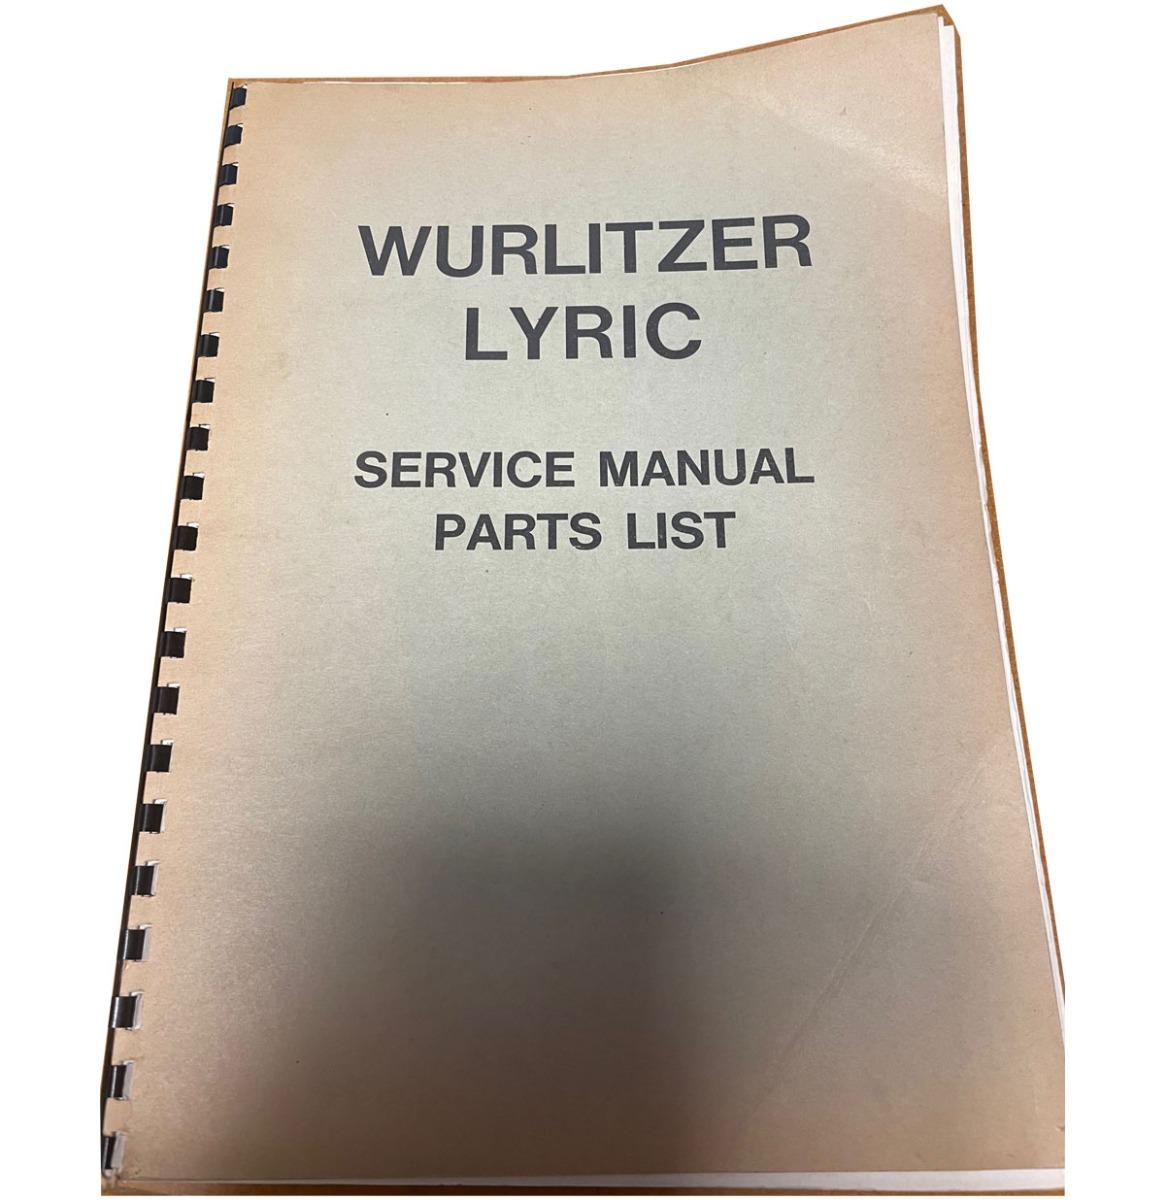 Wurlitzer Lyric FC And Console Service Manual 1967 Origineel